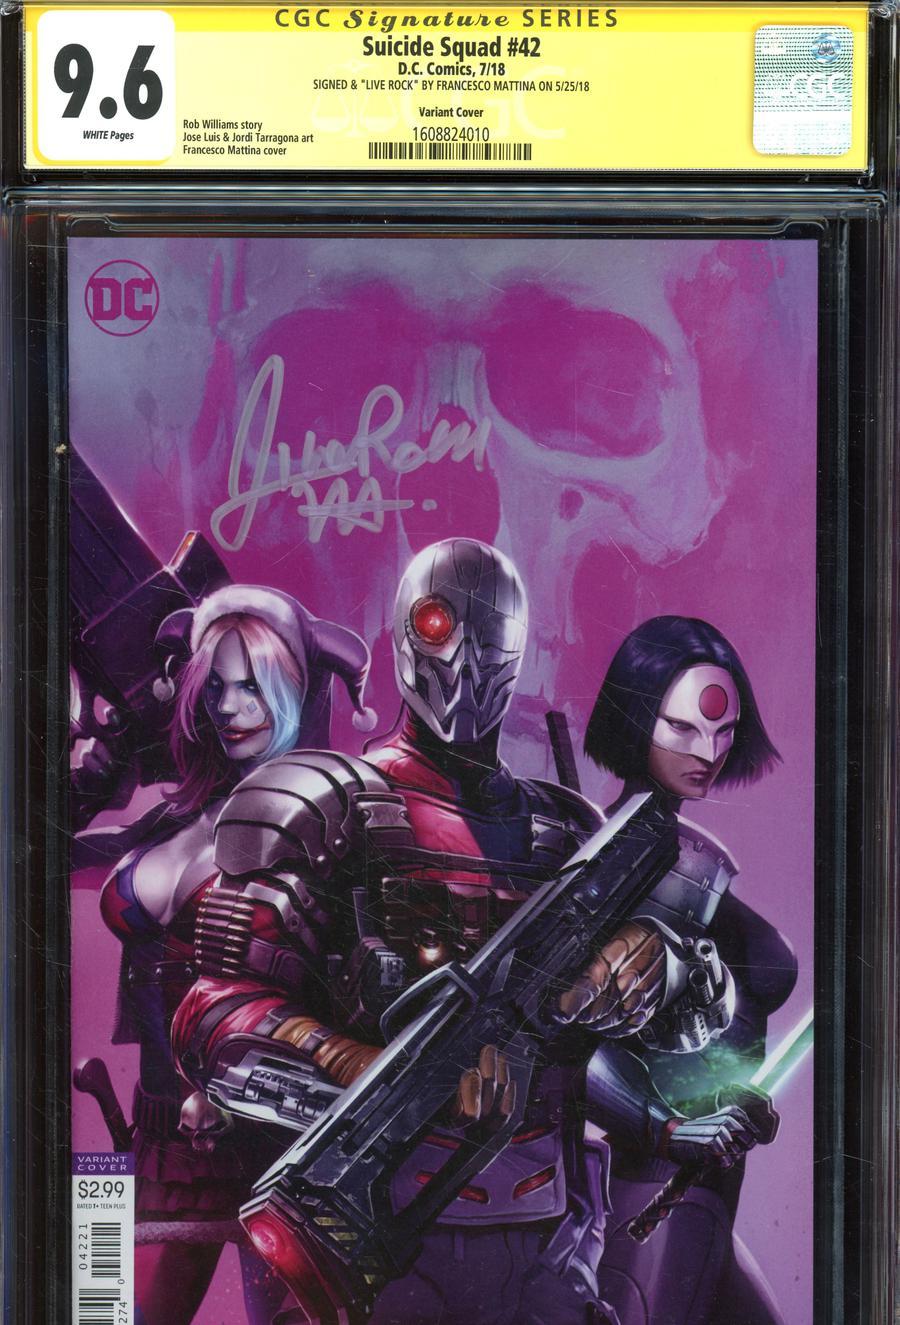 Suicide Squad Vol 4 #42 Cover C Variant Francesco Mattina Cover Signed By Franceco Mattina CGC 9.6